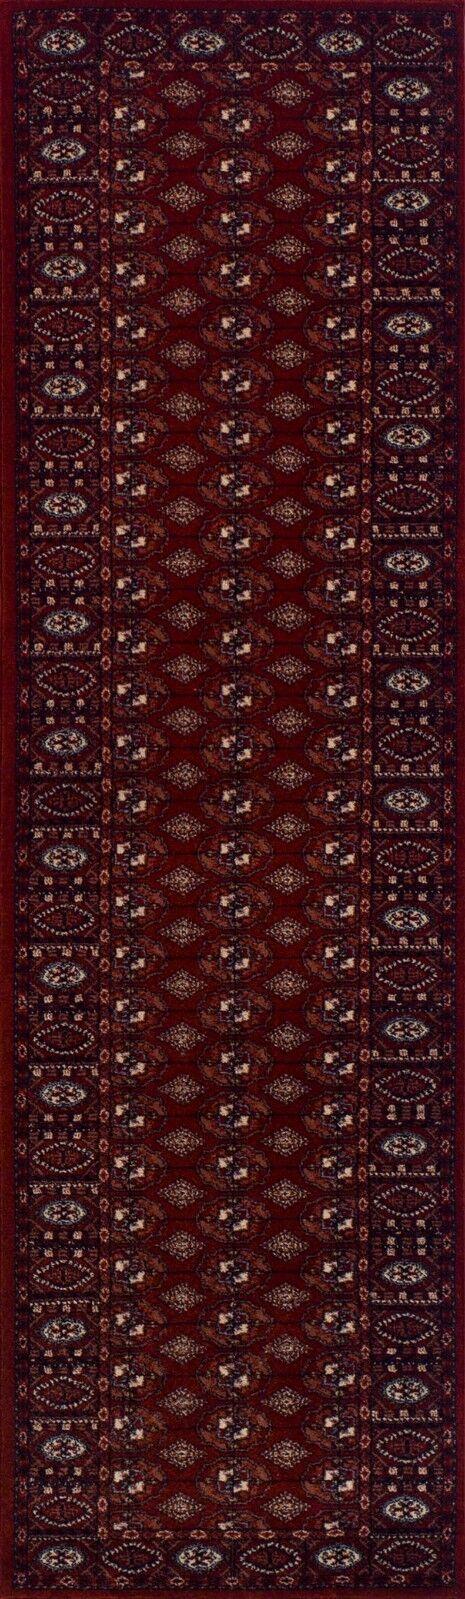 Qualité Rouge Rouge Rouge Rouille Traditionnel Afghan Tribal Bokhara Tapis Coureur 100% laine -35% off | Achats En Ligne  549e87